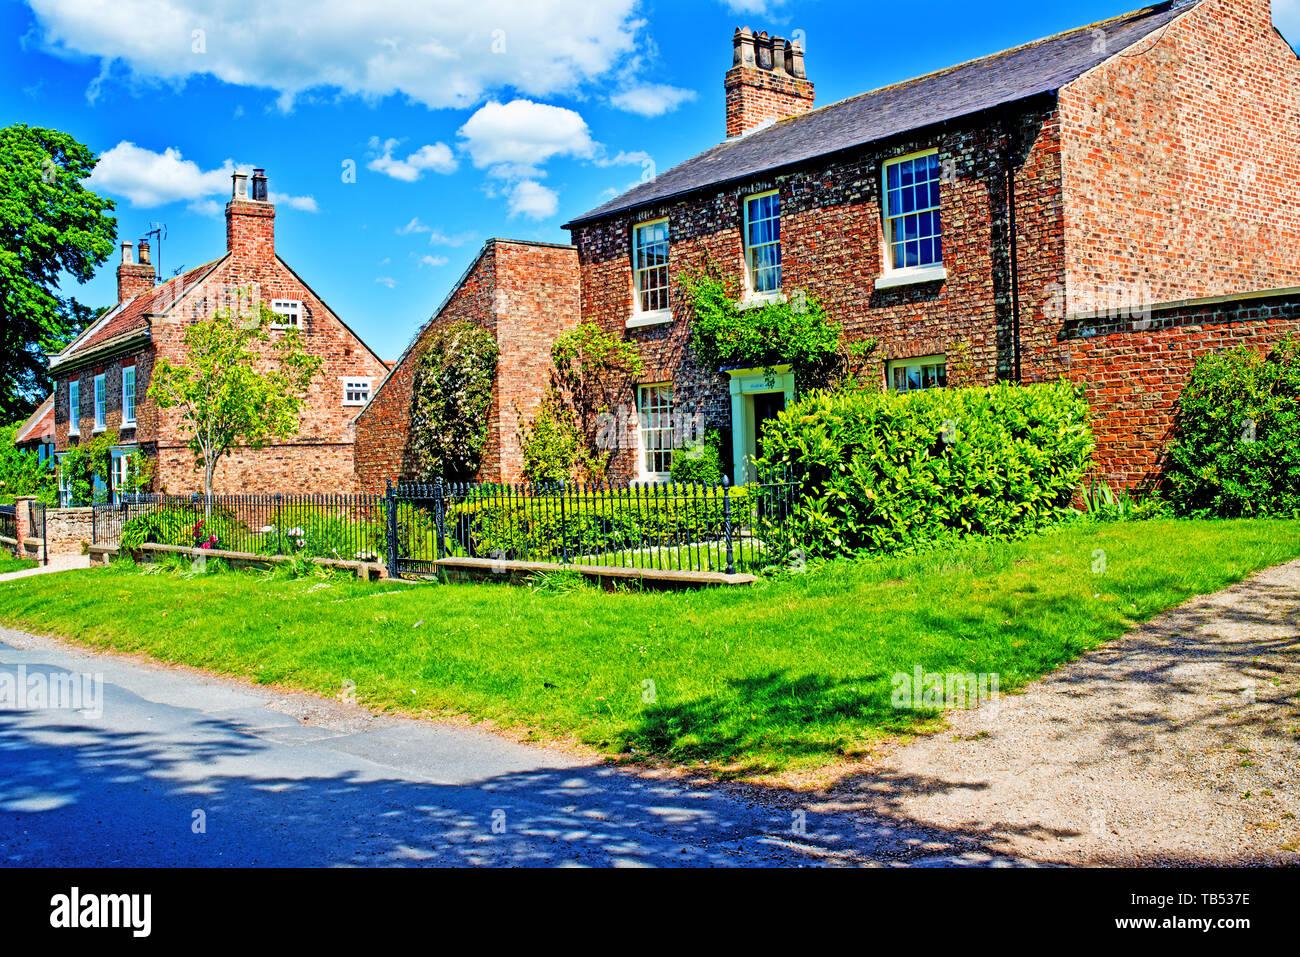 Green Hammerton, North Yorkshire, England Stock Photo